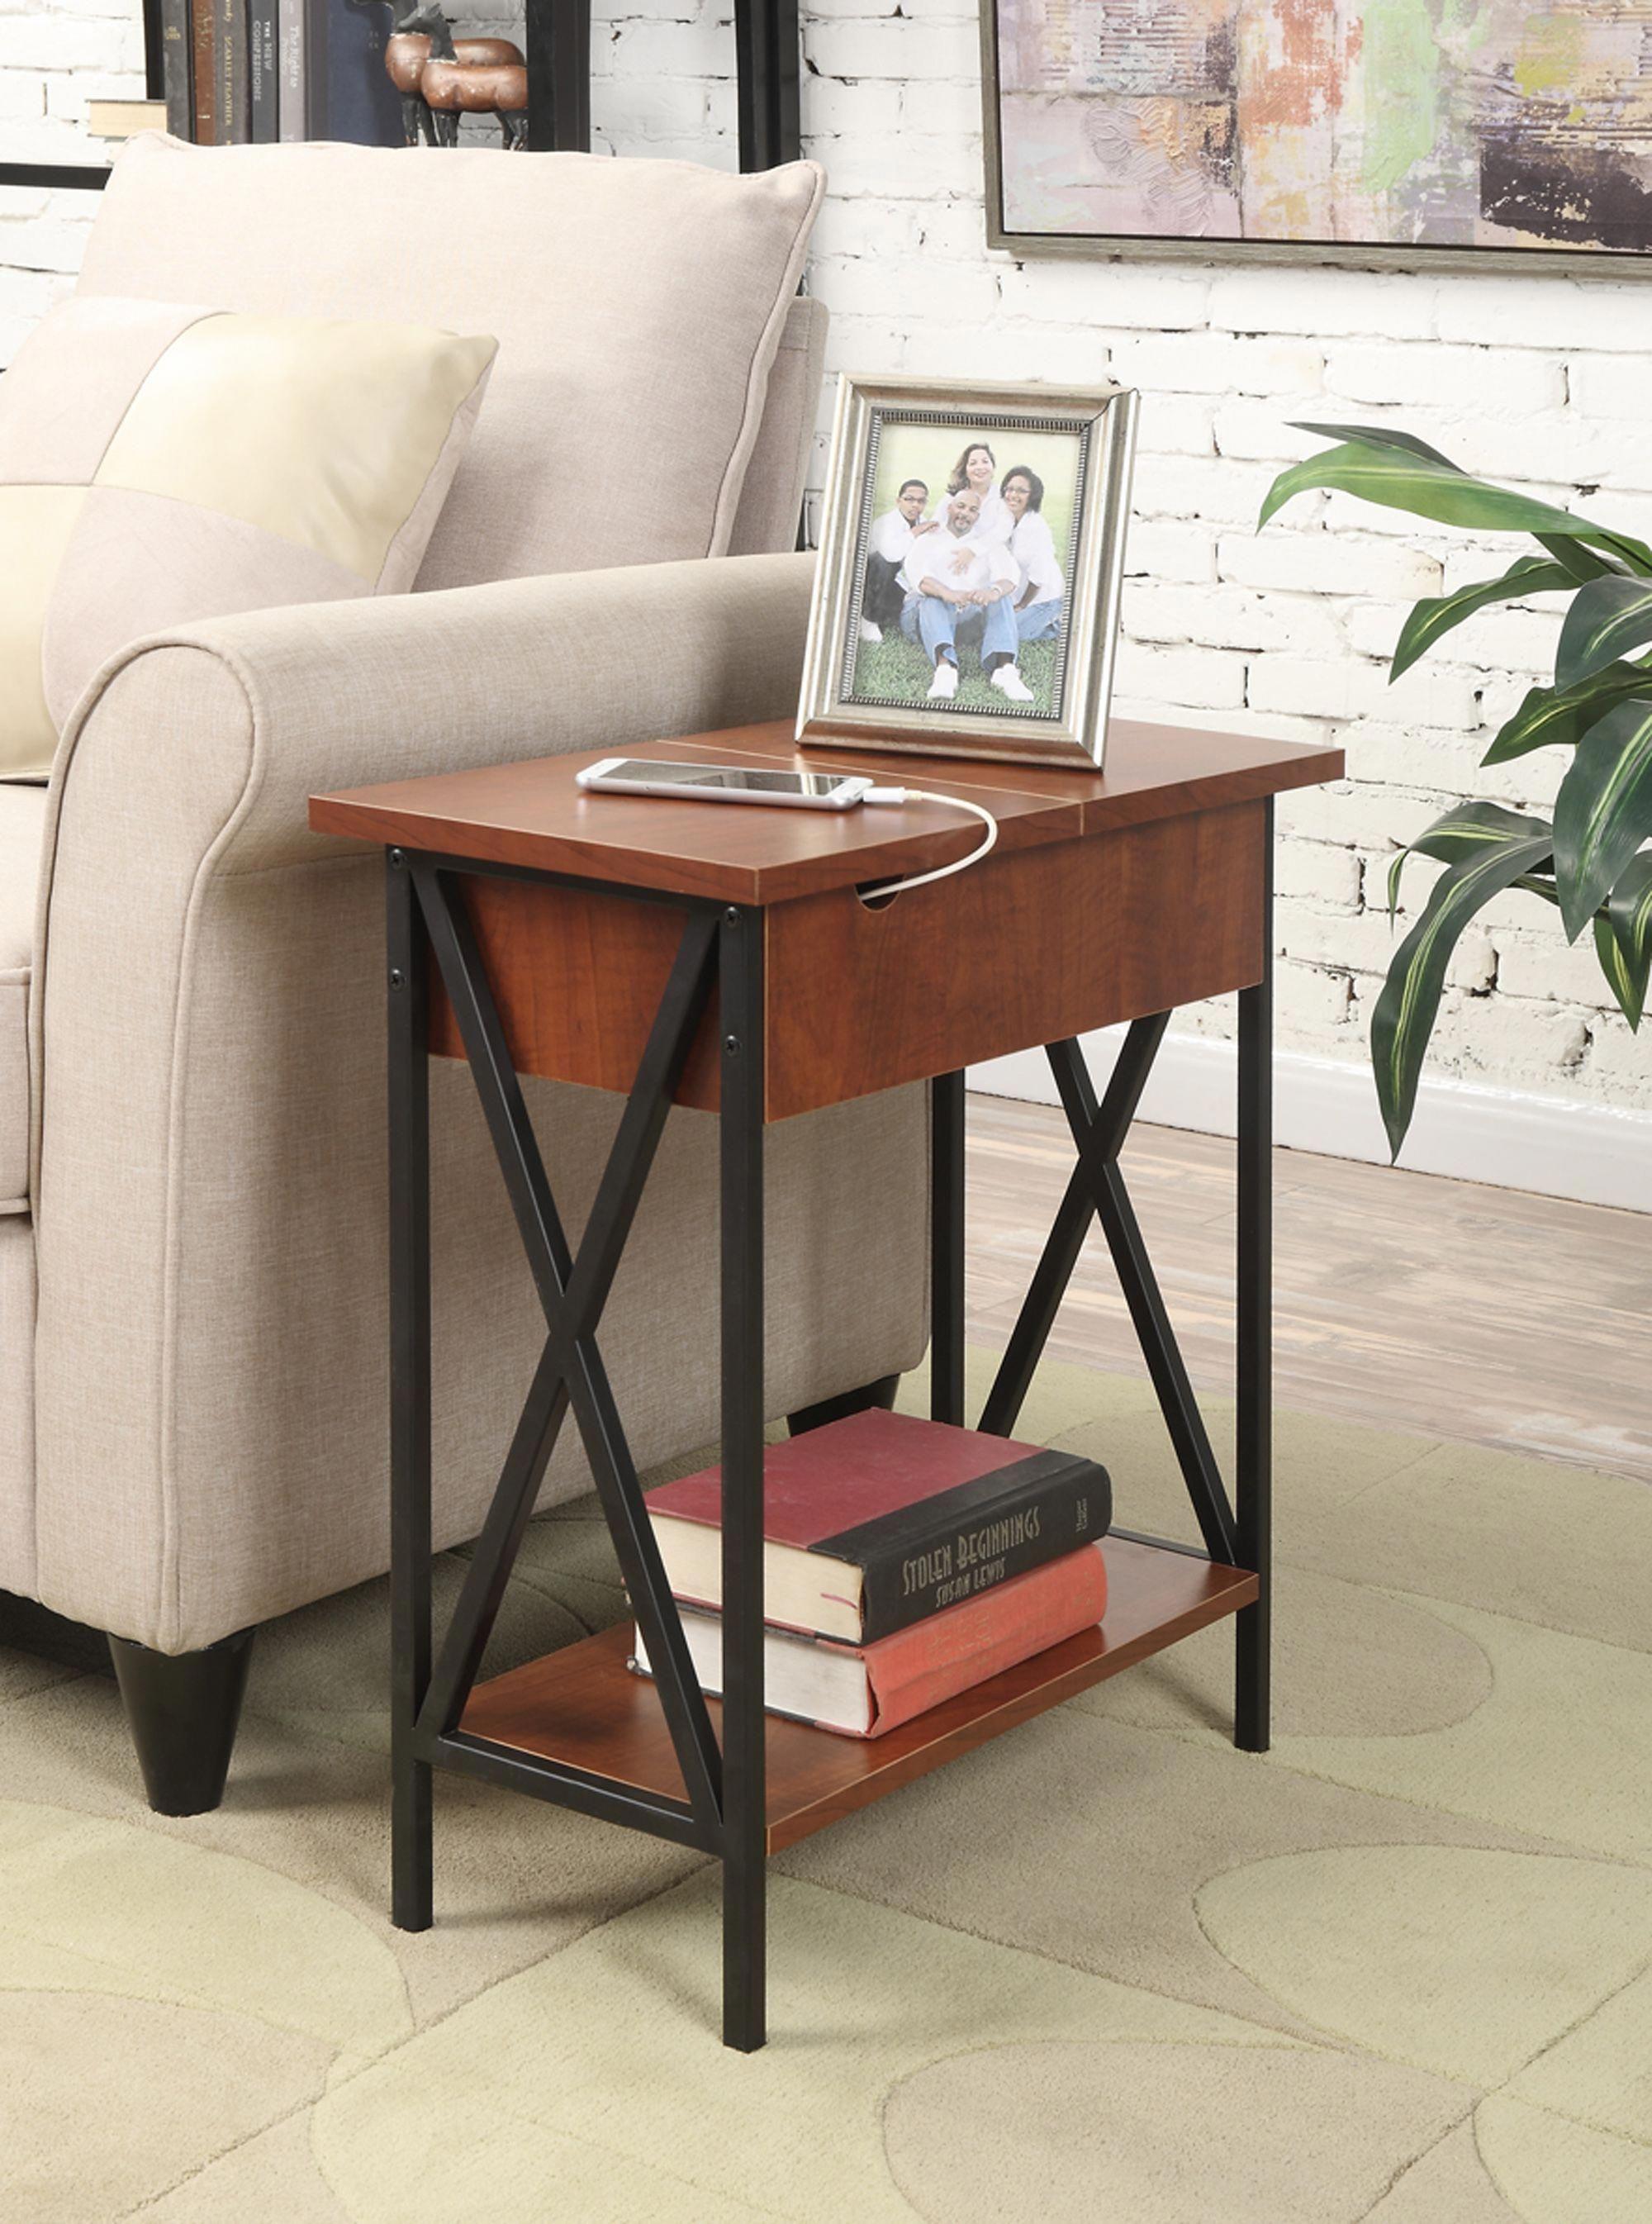 Furniture Shipping Options Erpsoftwarefurnitureindustry Code 6262953822 Entrywayfurniture End Tables Flip Top Table Furniture